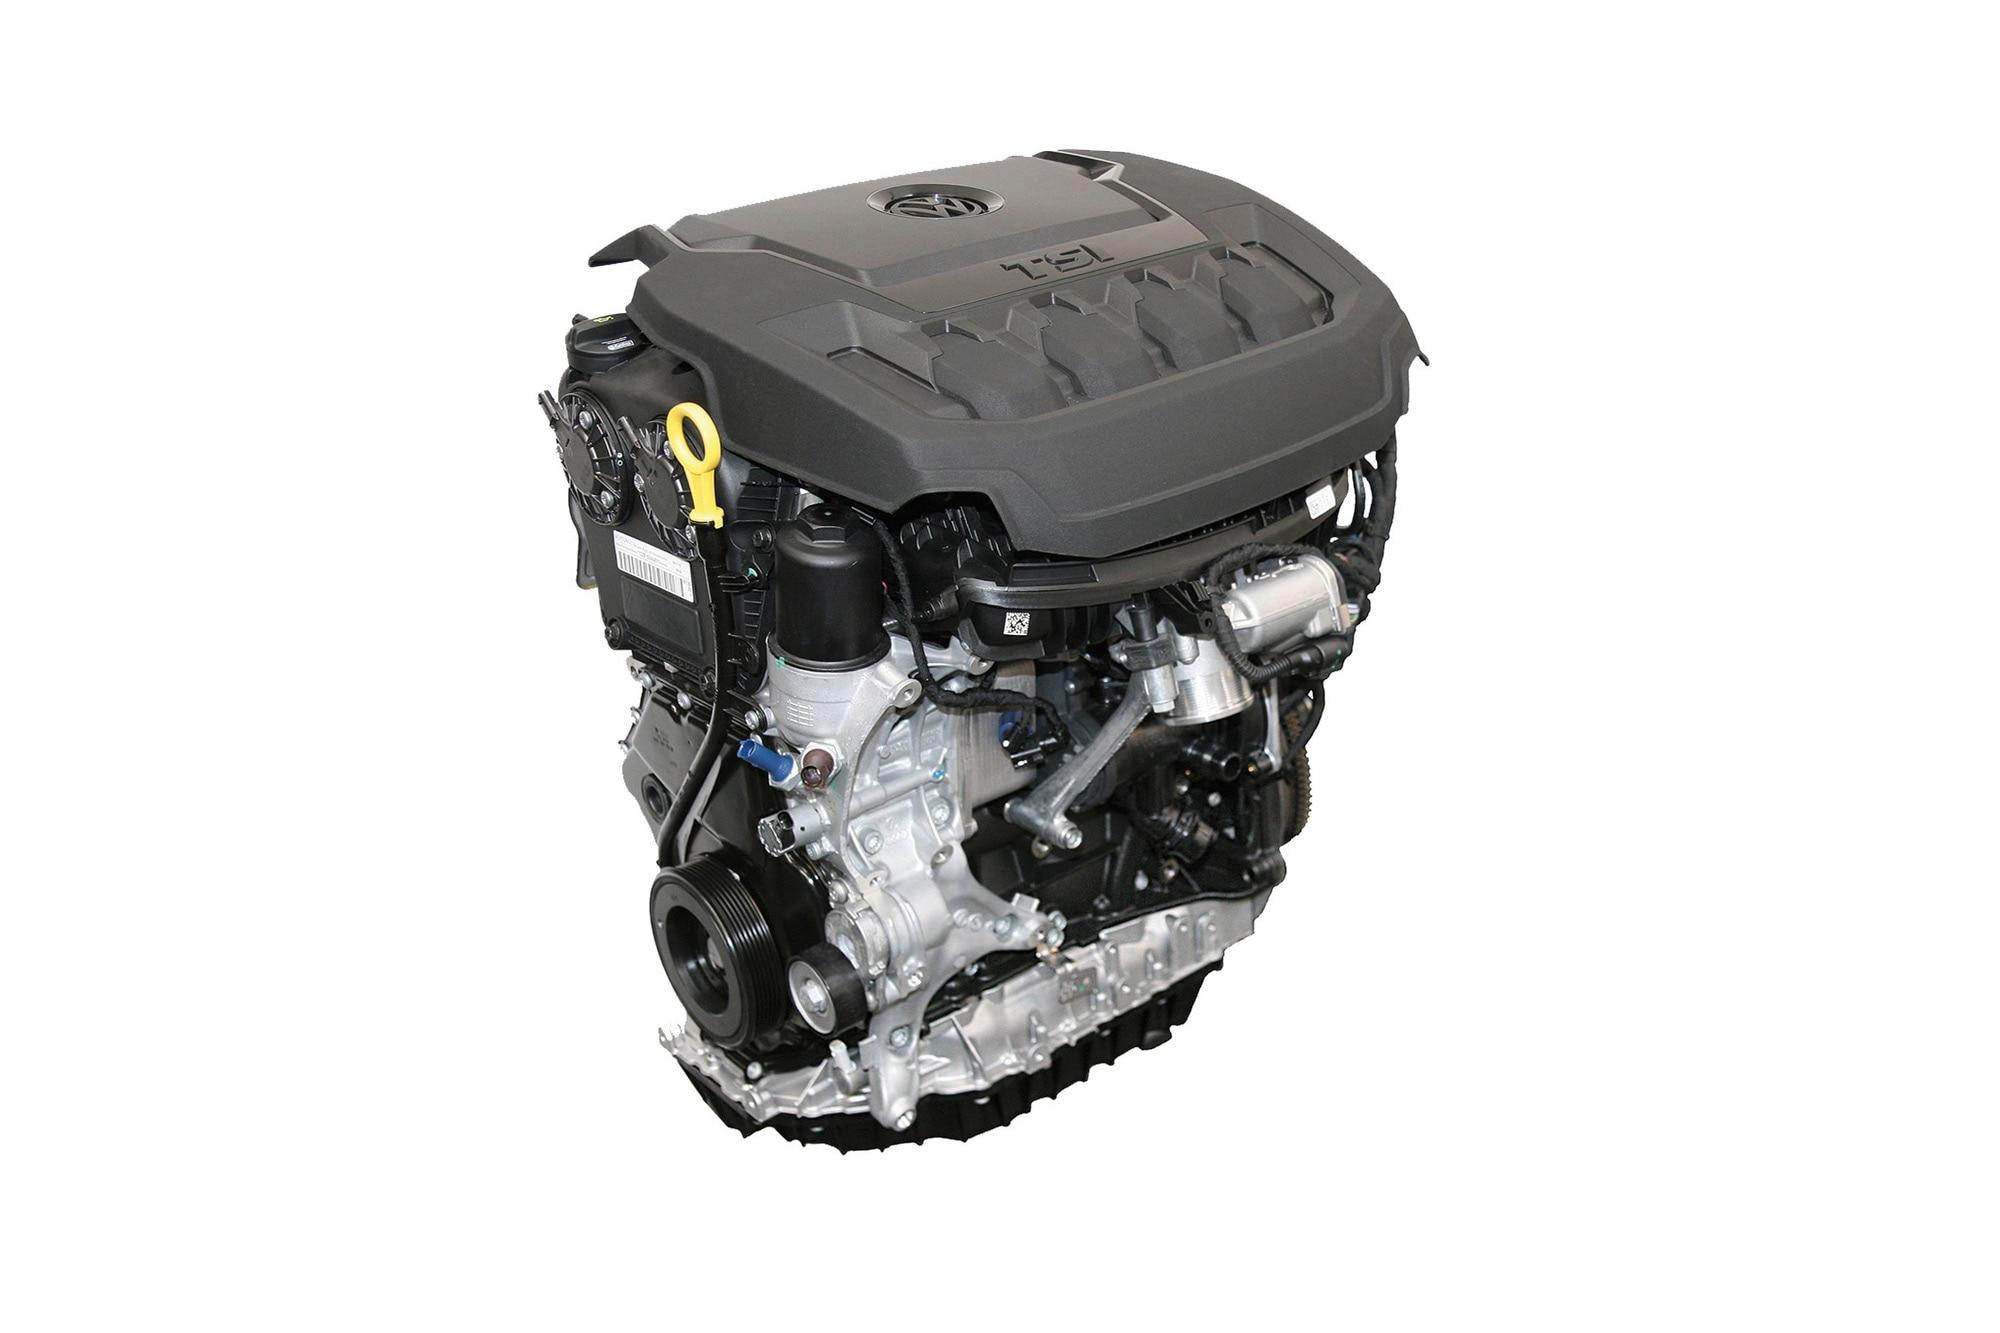 2 0 tsi engine diagram on deep dive inside the new volkswagen ea888 b cycle 2 0 tsi i 4 2.0 Turbo VW Enhine VW Performance Engine Kits